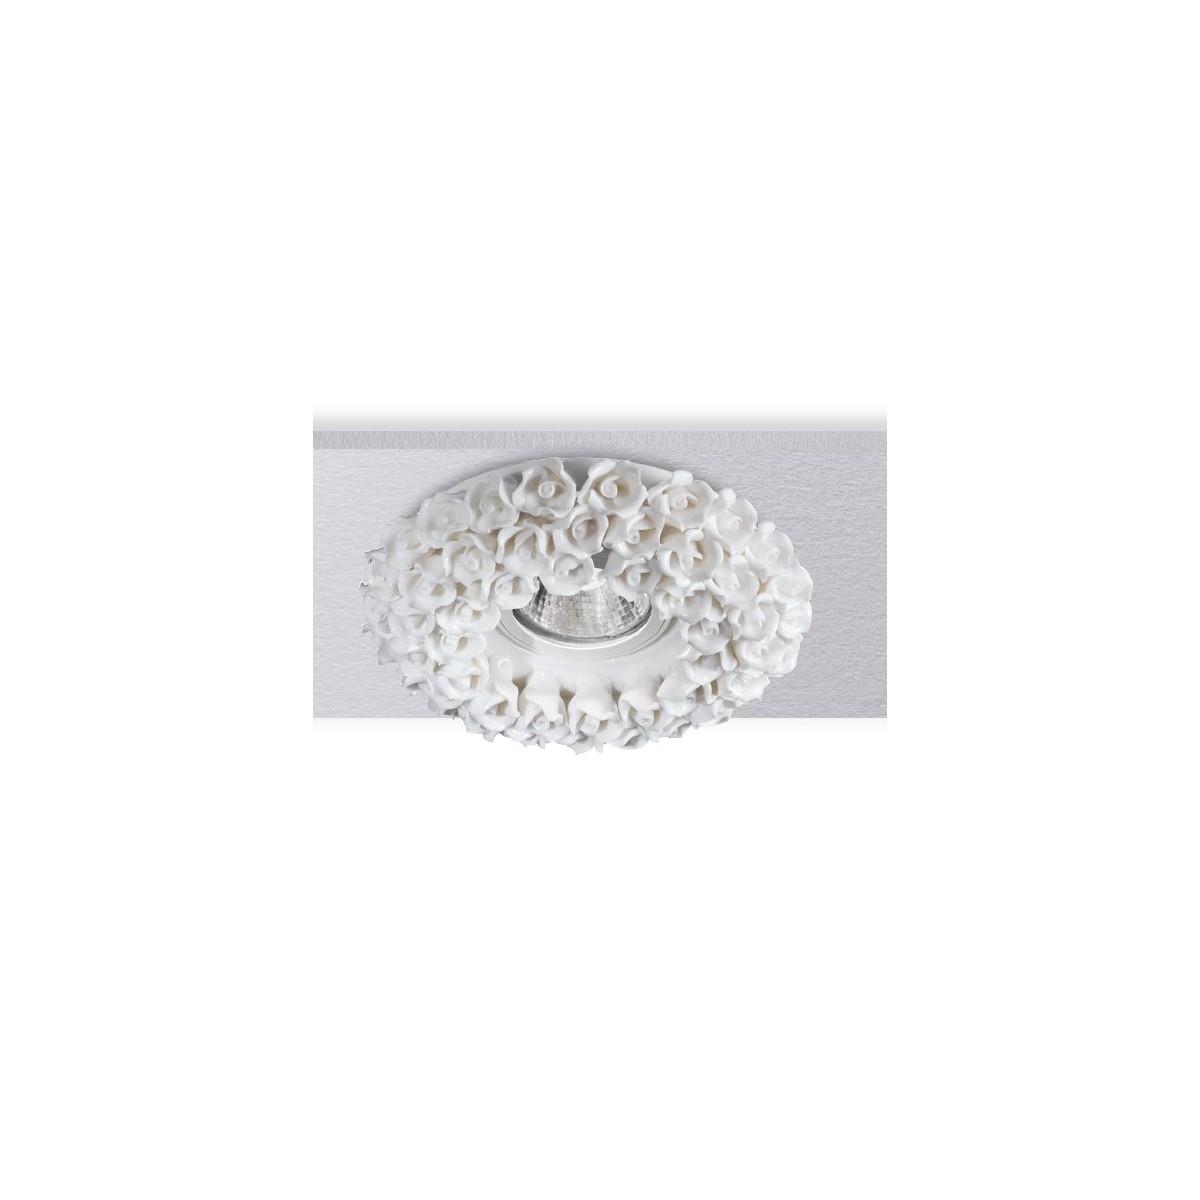 INC-FLORENZA-BCO - Incasso Controsoffittatura Faretto Porcellana Bianca Decoro Rose Artigianale MR16